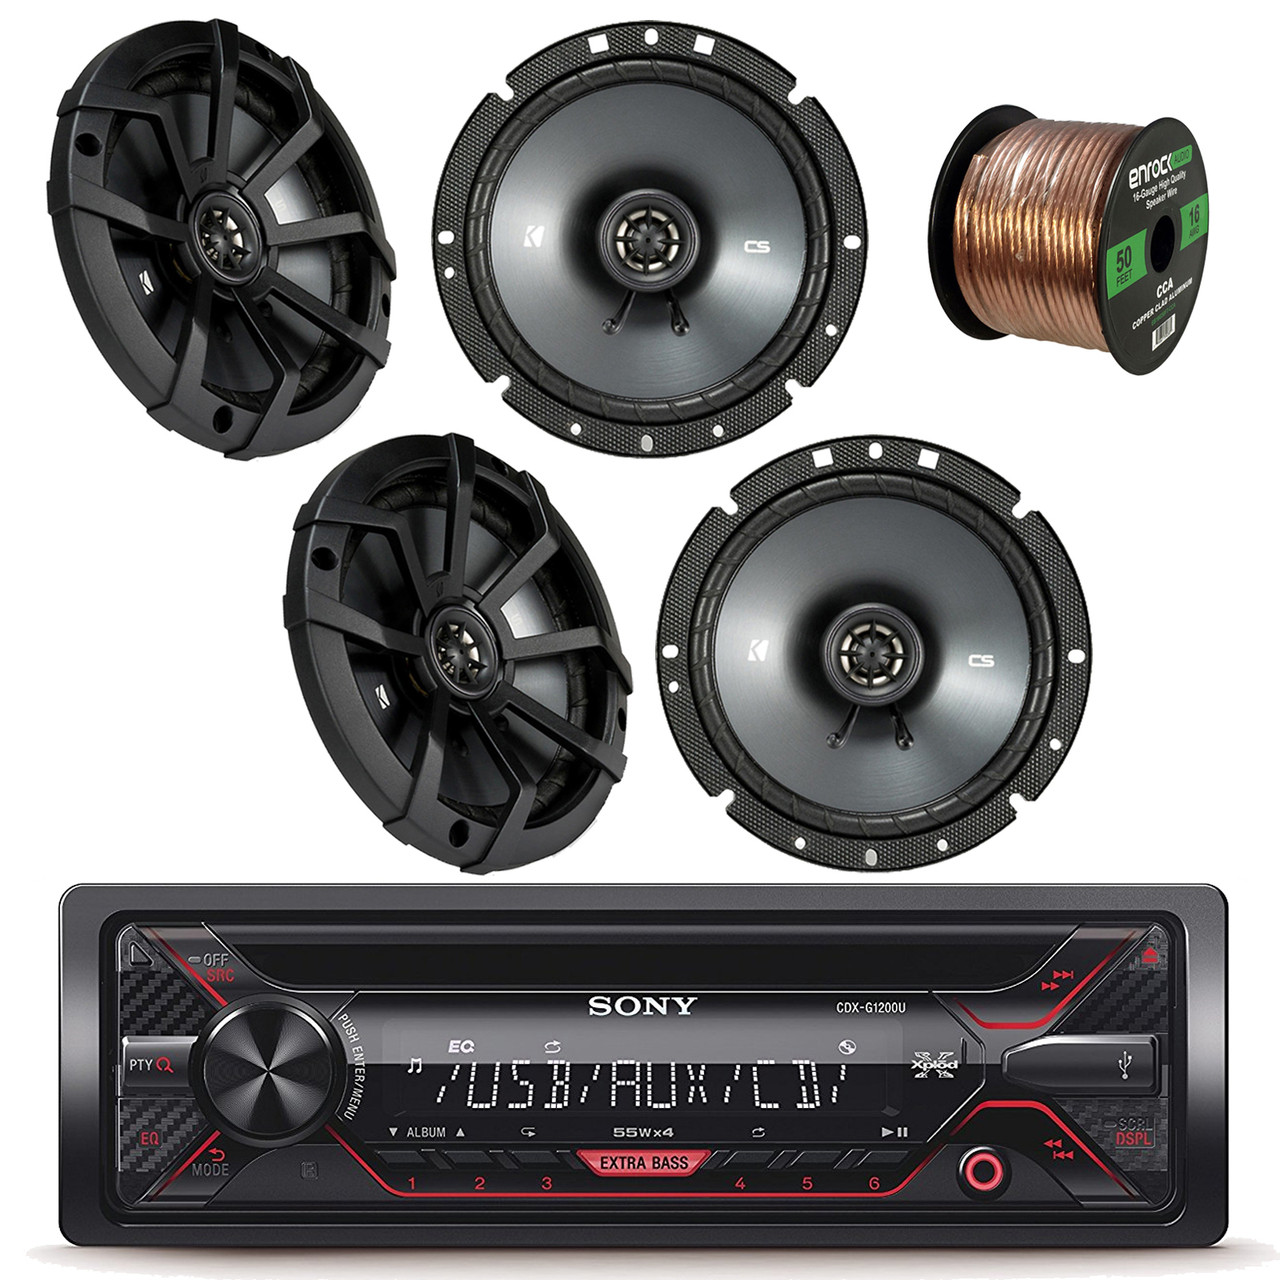 hight resolution of sony xplod cdxg1200u receiver with 52x4 watt amp with kicker 43csc674 6 3 4 inch 600 watt cs series black car coaxial speakers 2 pairs enrock audio